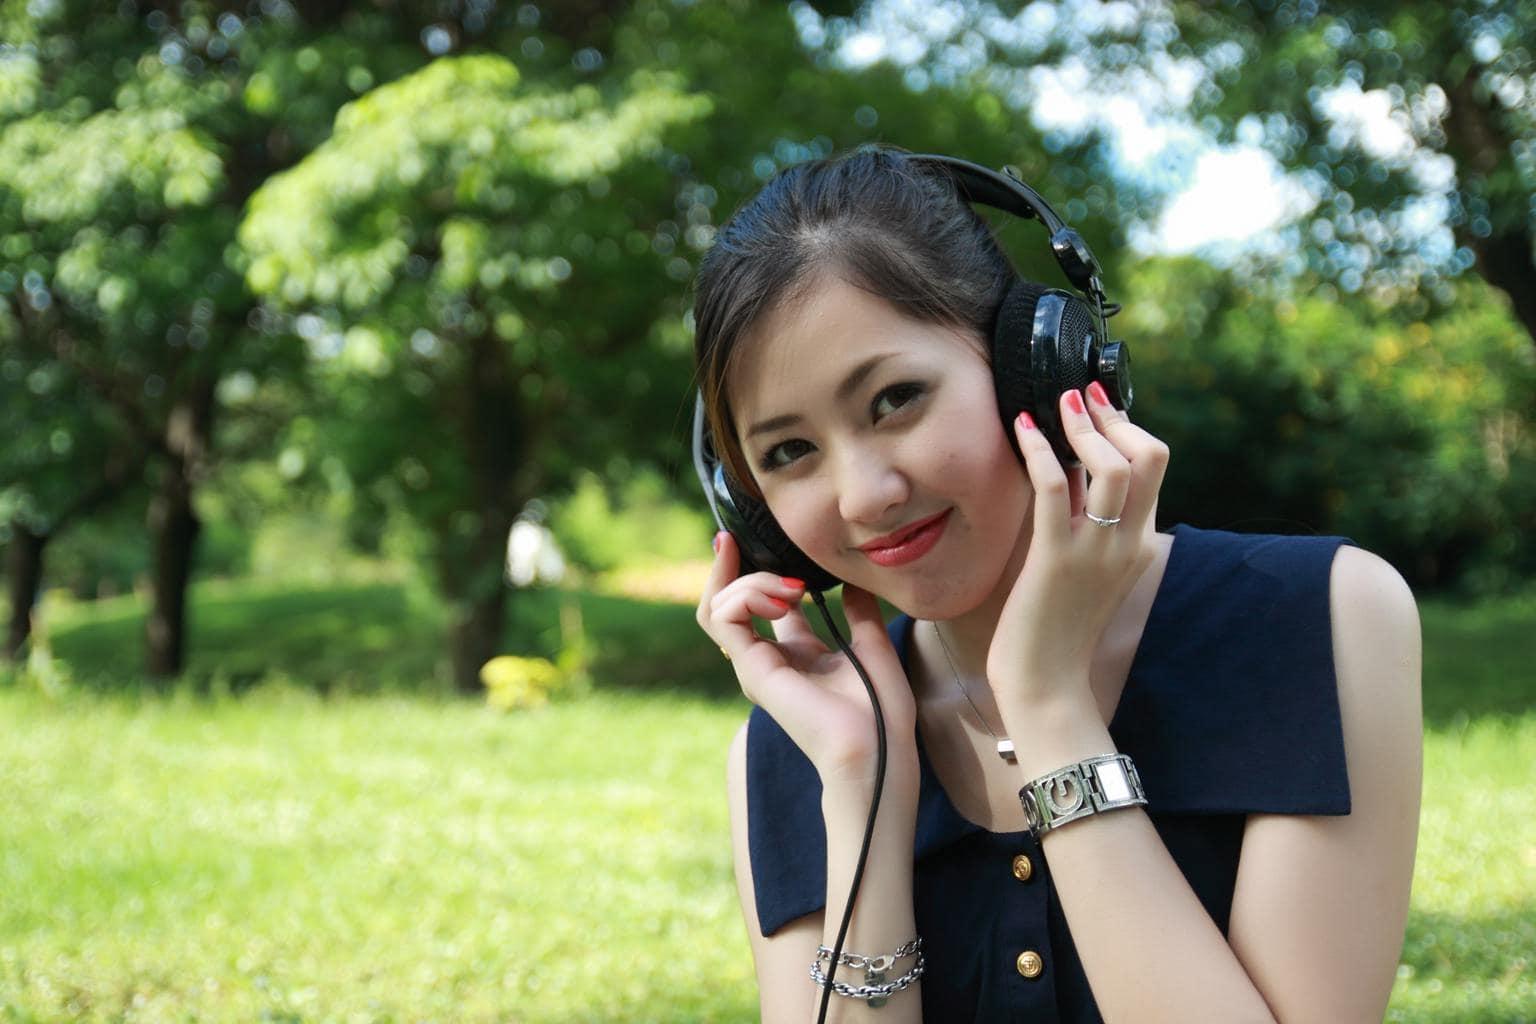 girl listening to music through headphones